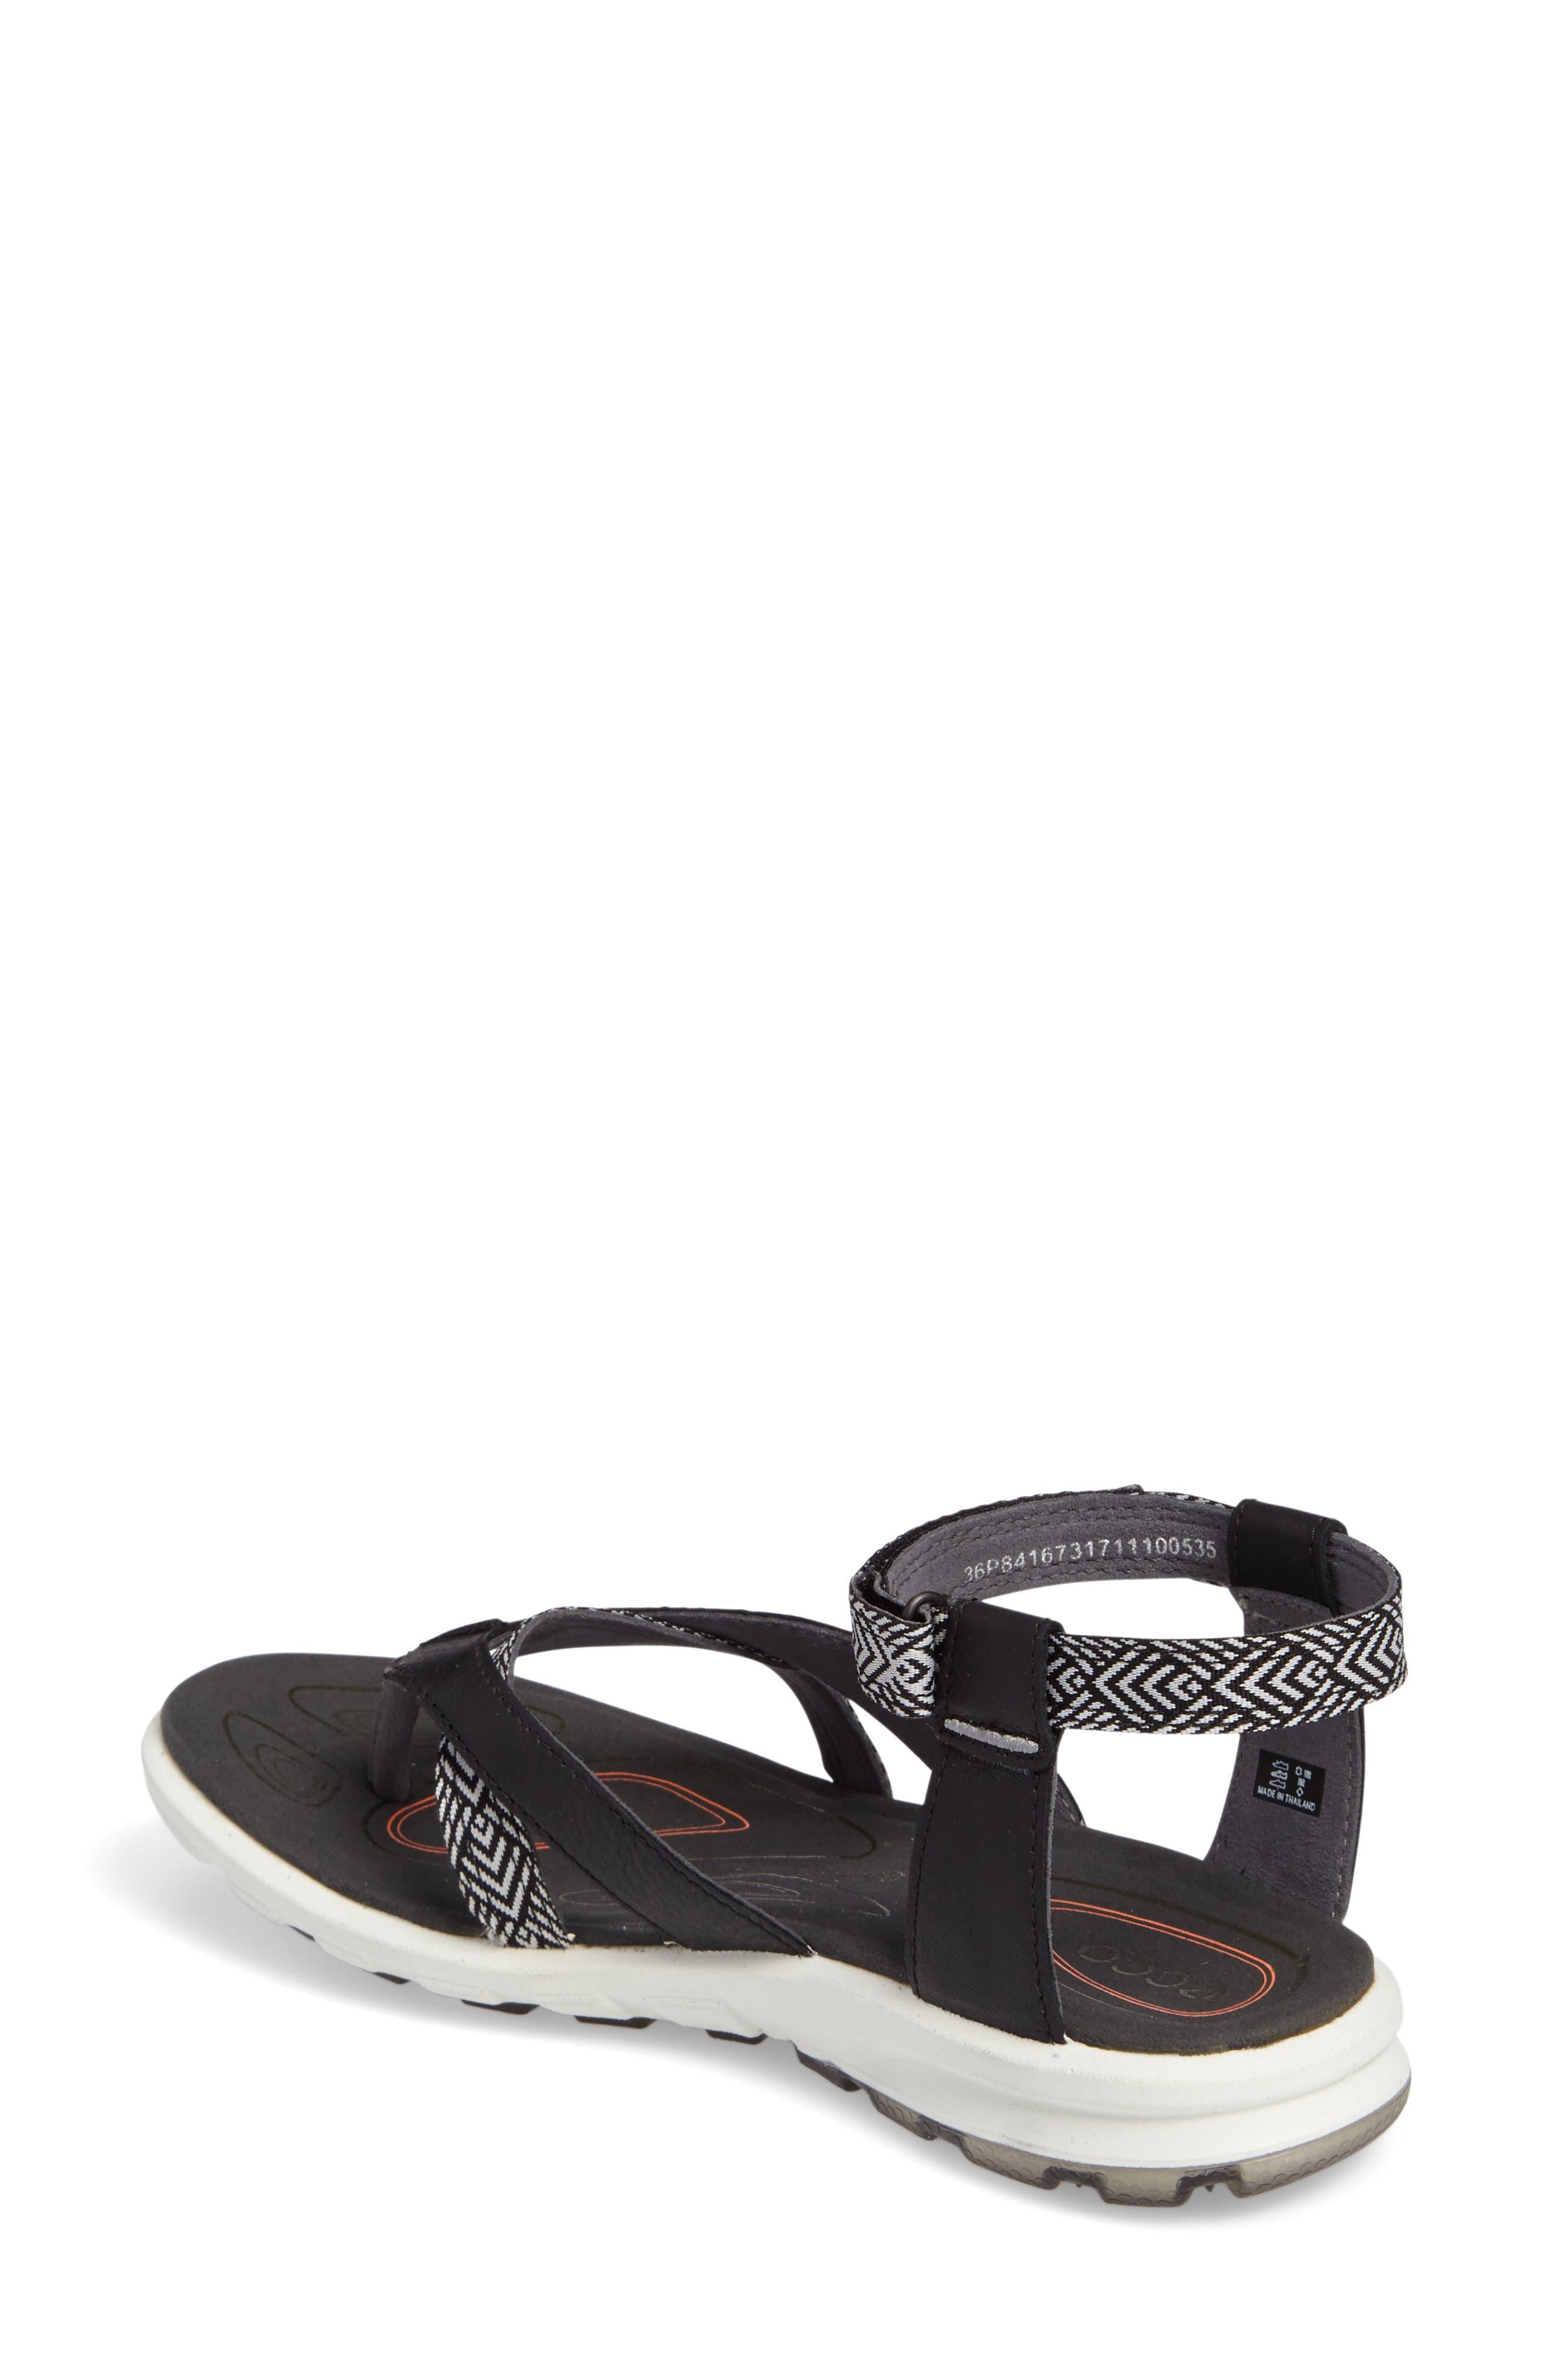 Cruise Sport Sandal,                             Alternate thumbnail 2, color,                             Black Leather